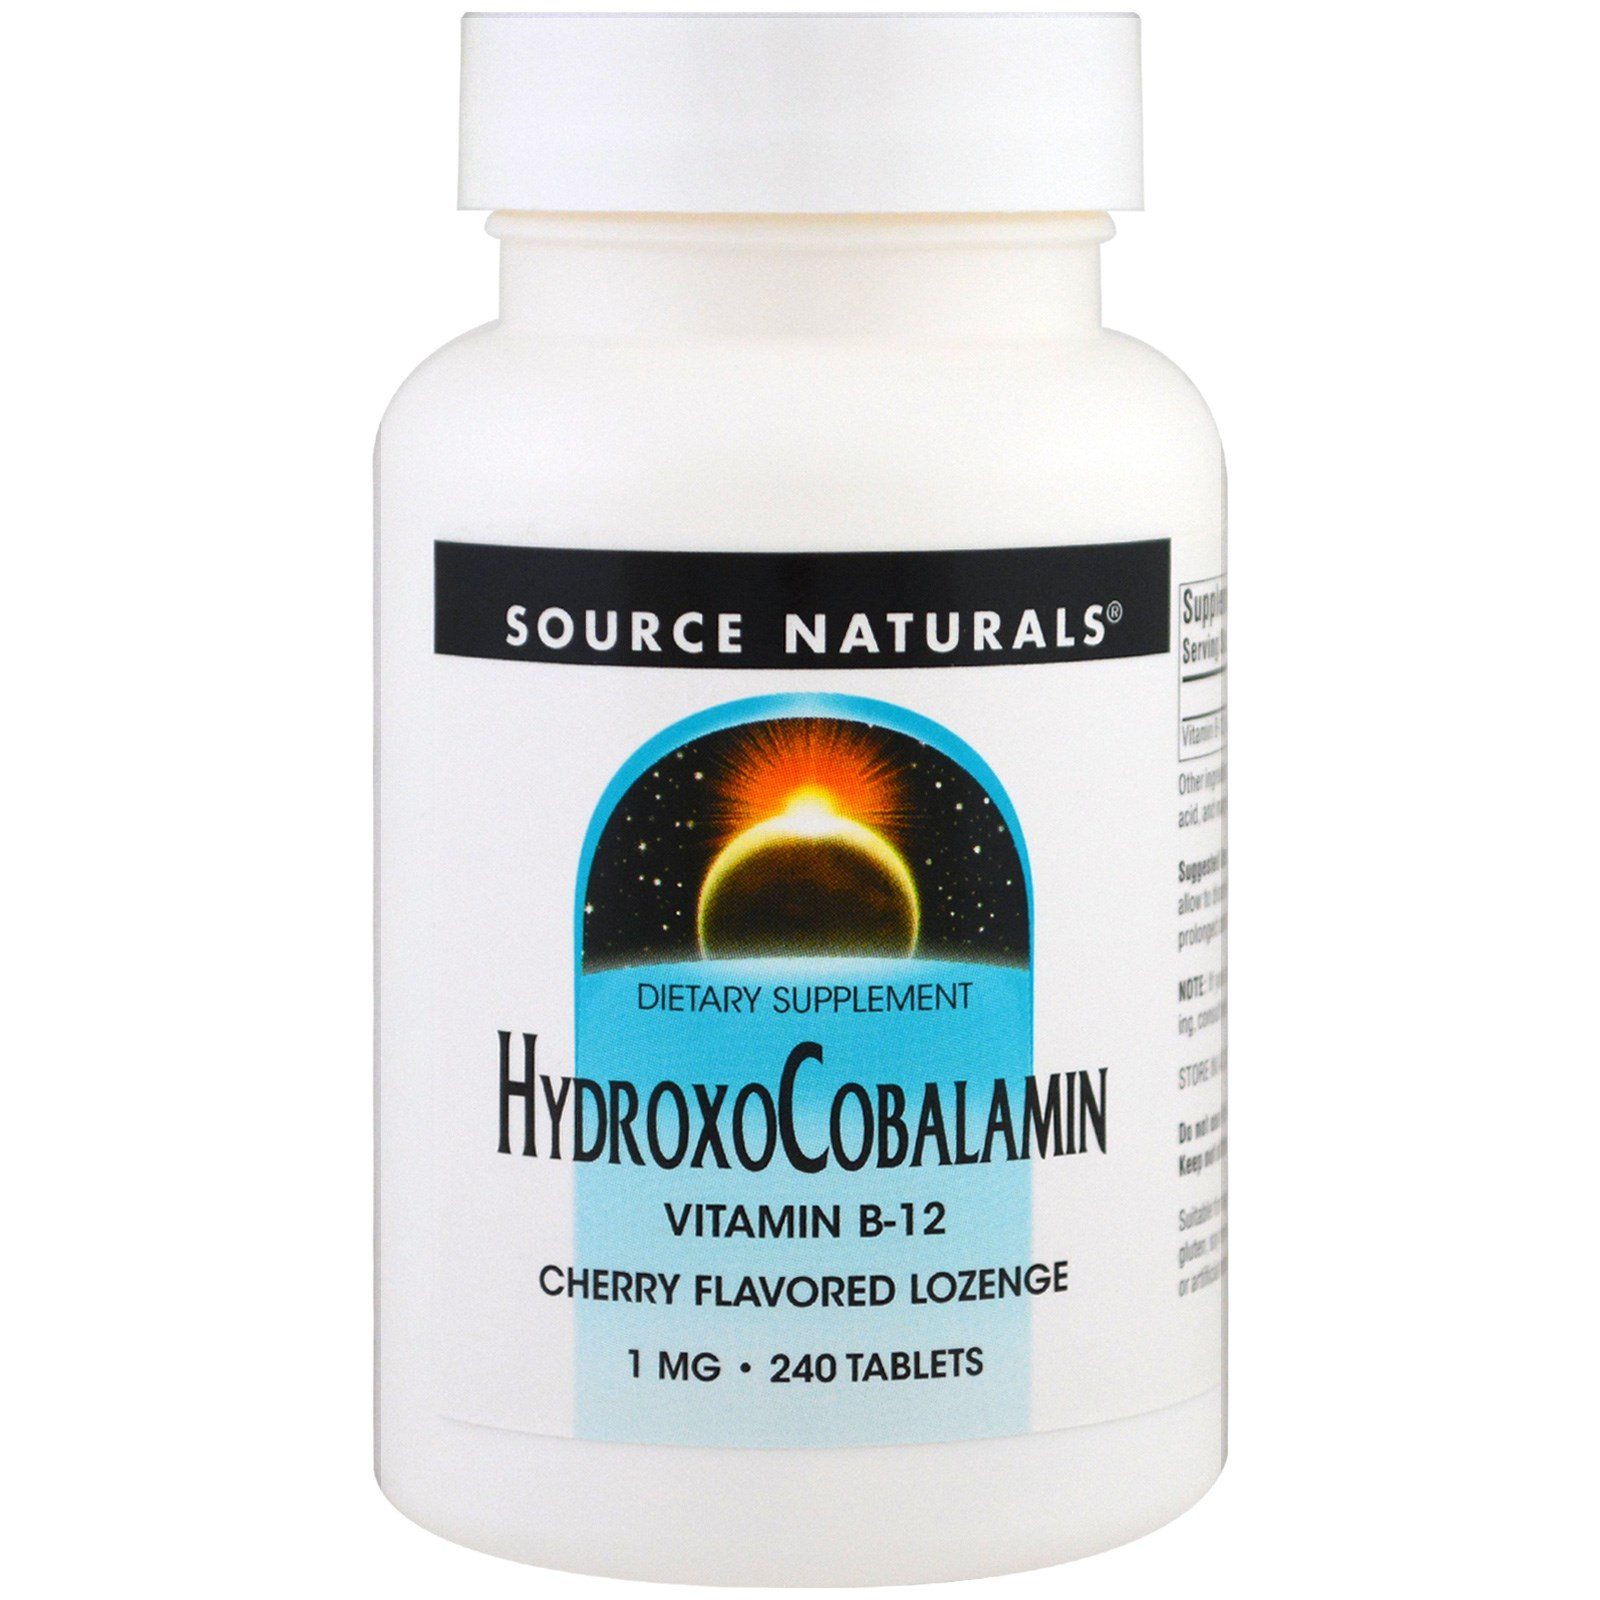 Source Naturals, ГидроксоКобаламин, витамин B-12, вишневый вкус, 1 мг , 240 таблеток